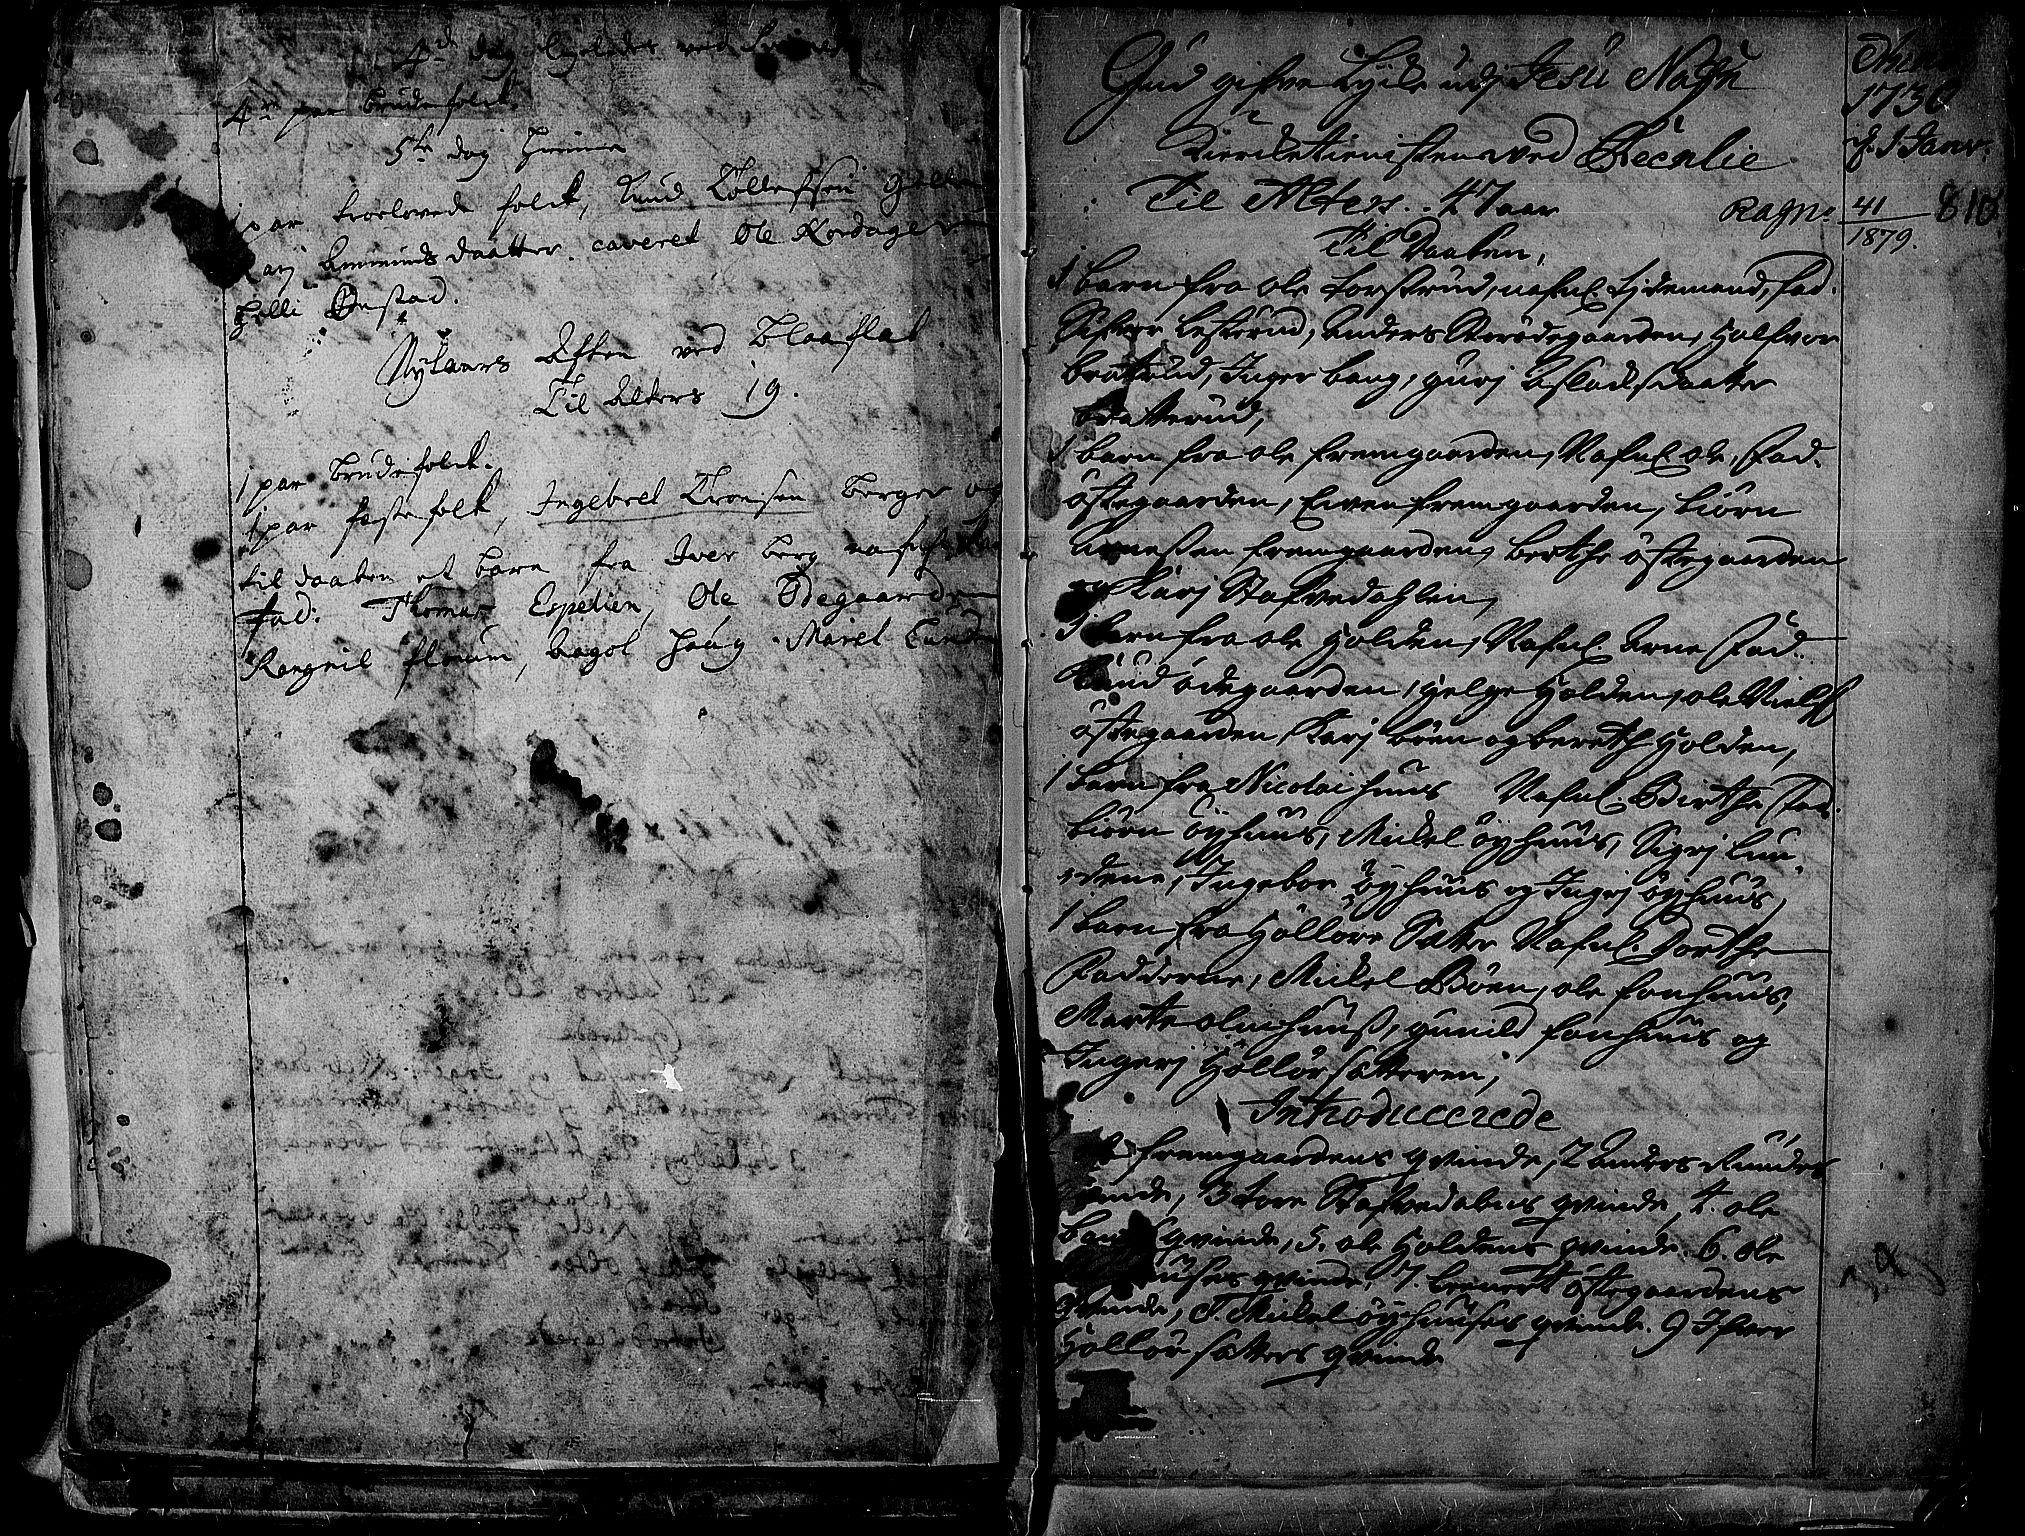 SAH, Aurdal prestekontor, Ministerialbok nr. 1-3, 1692-1730, s. 810